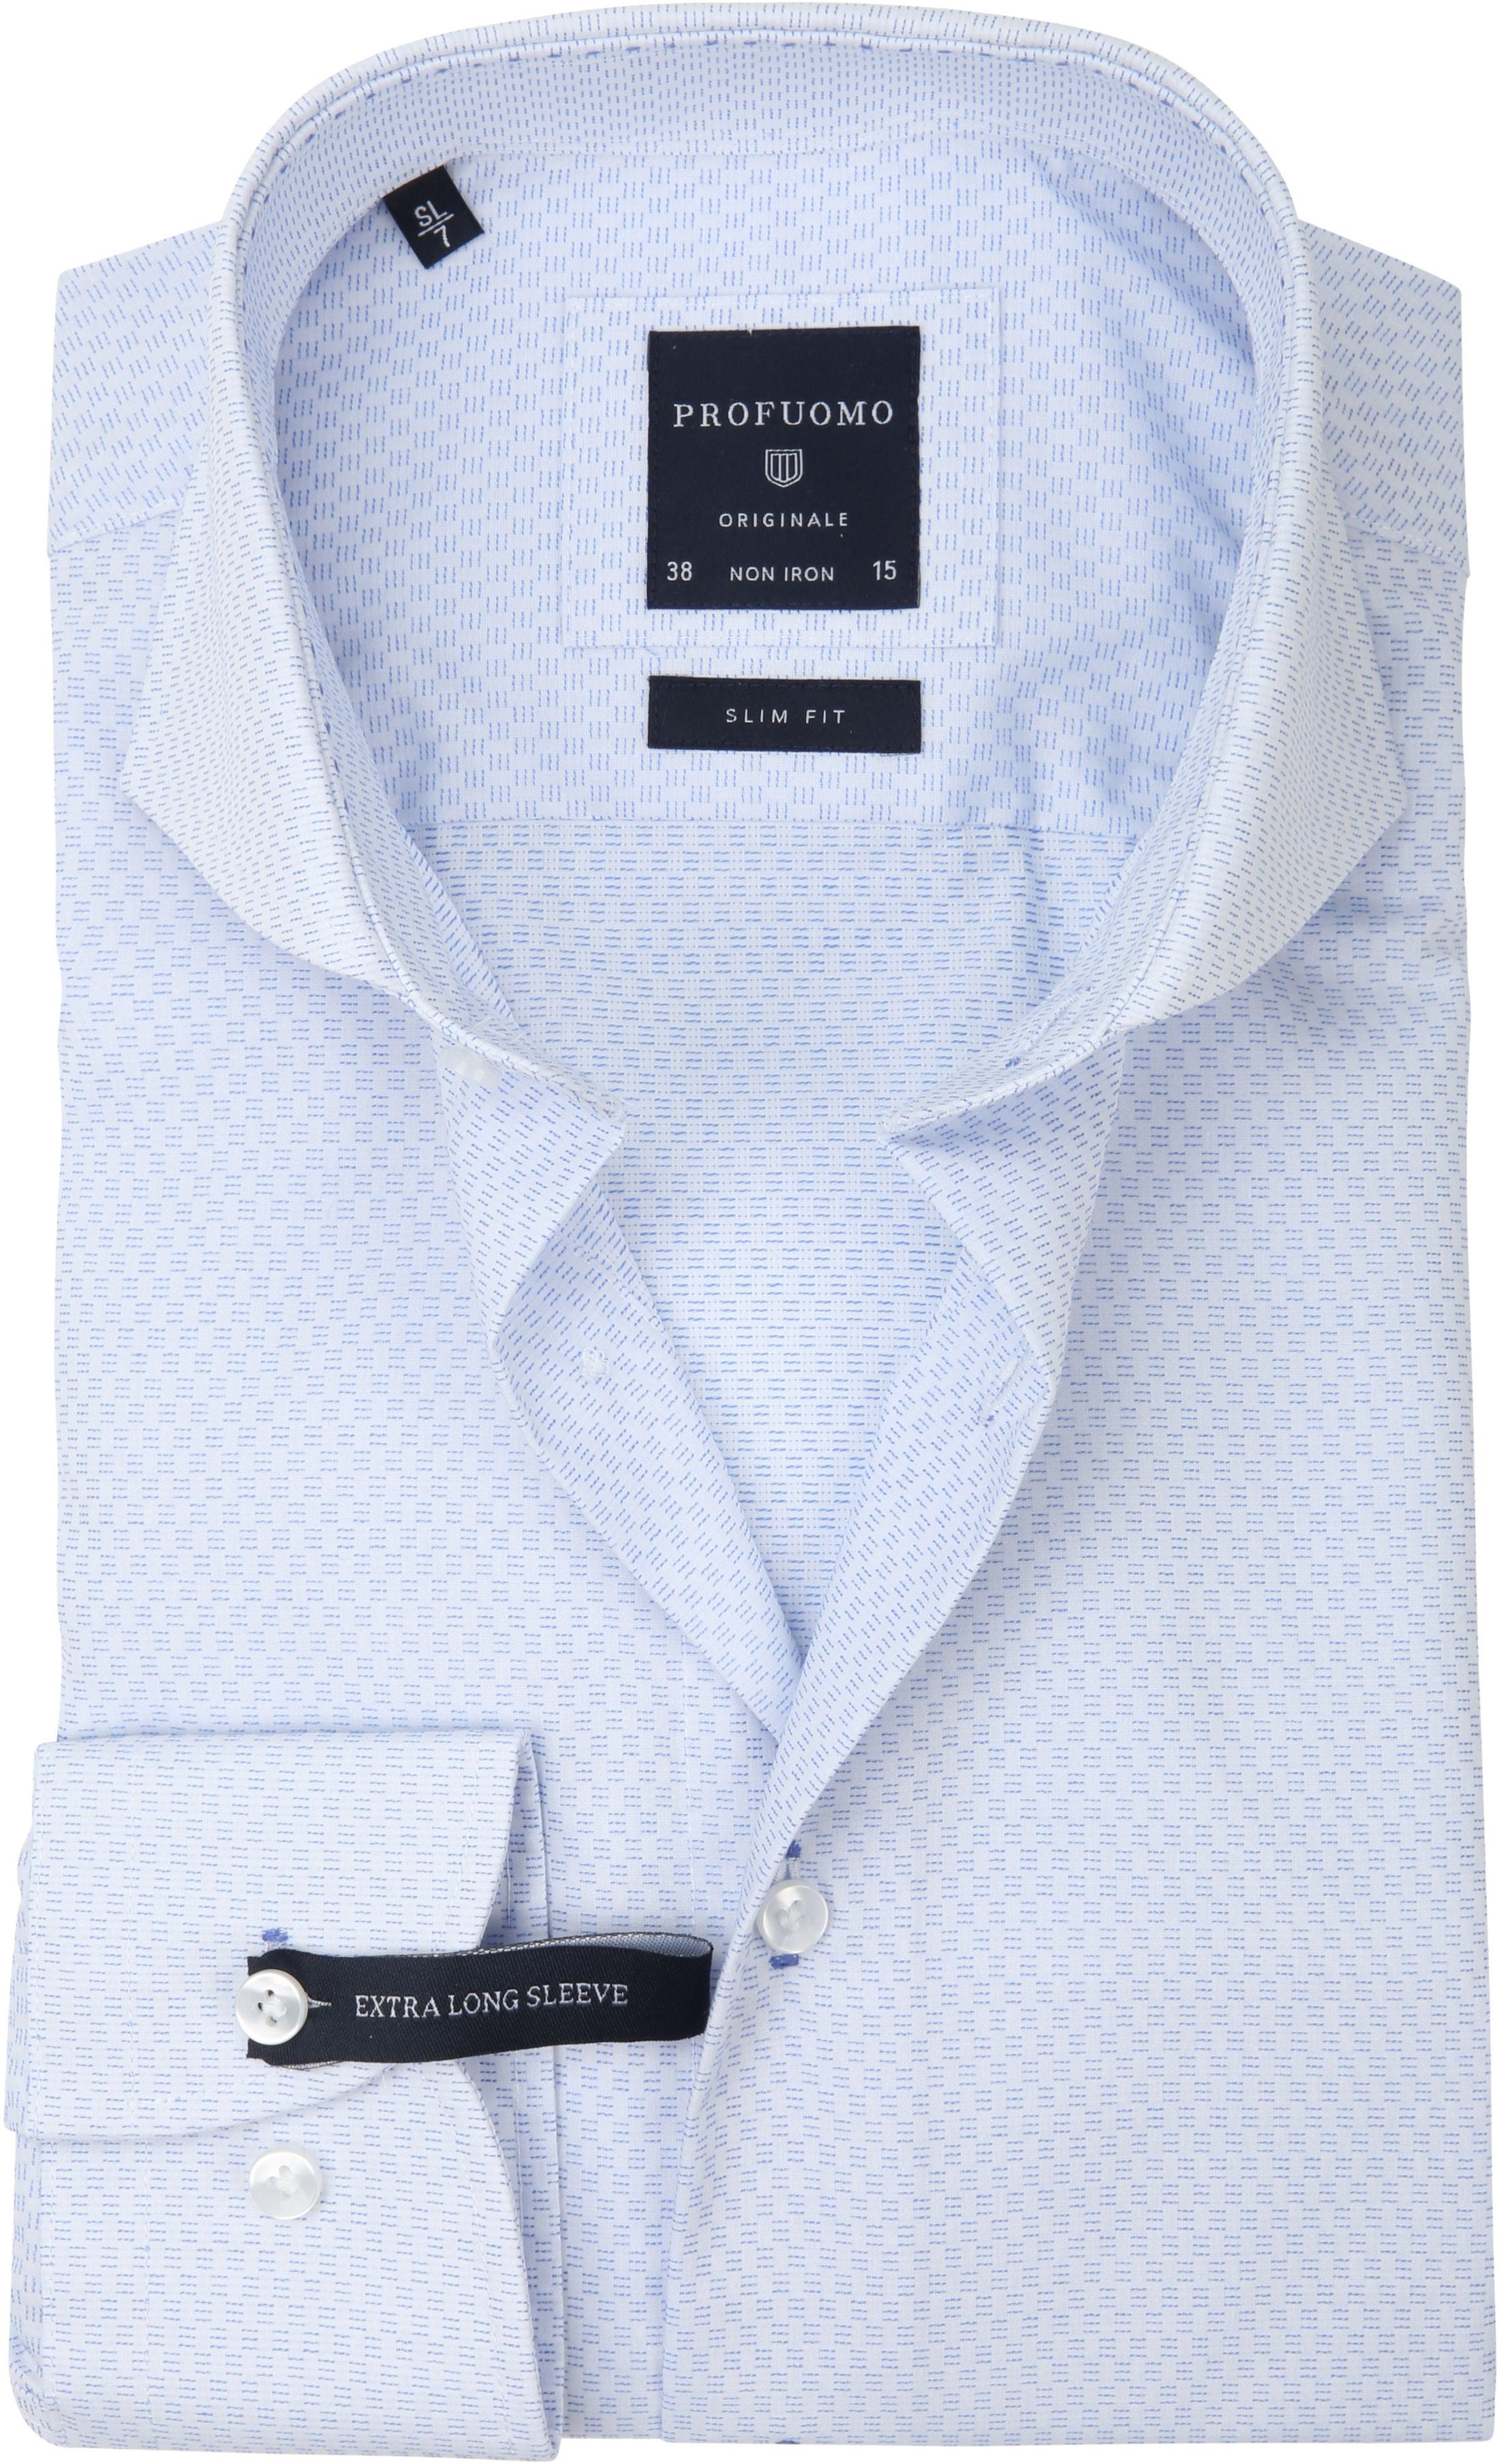 Profuomo Slim-Fit Overhemd Blauw SL7 foto 0